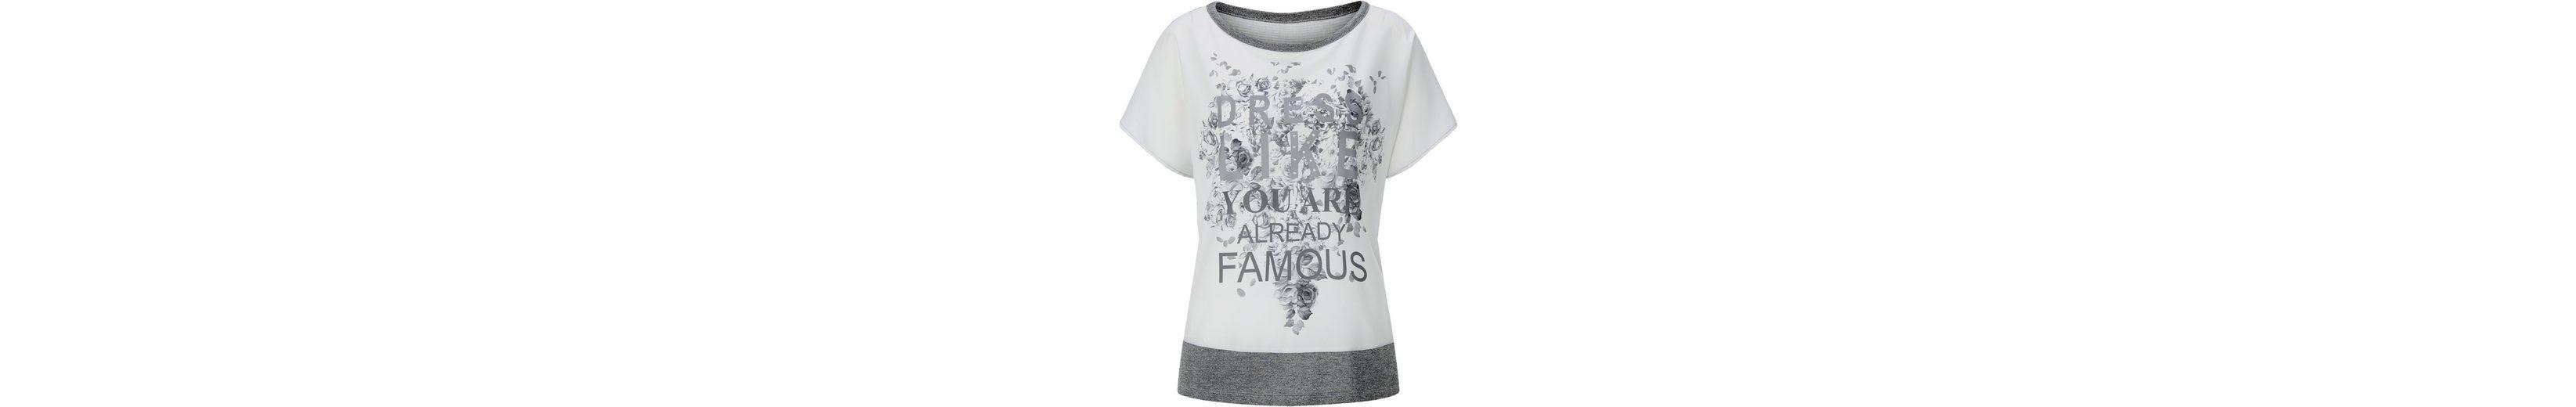 Classic Inspirationen Shirt im Materialmix Billig Verkauf Größte Lieferant Freies Verschiffen Beruf Spielraum Offiziellen dpgk1X